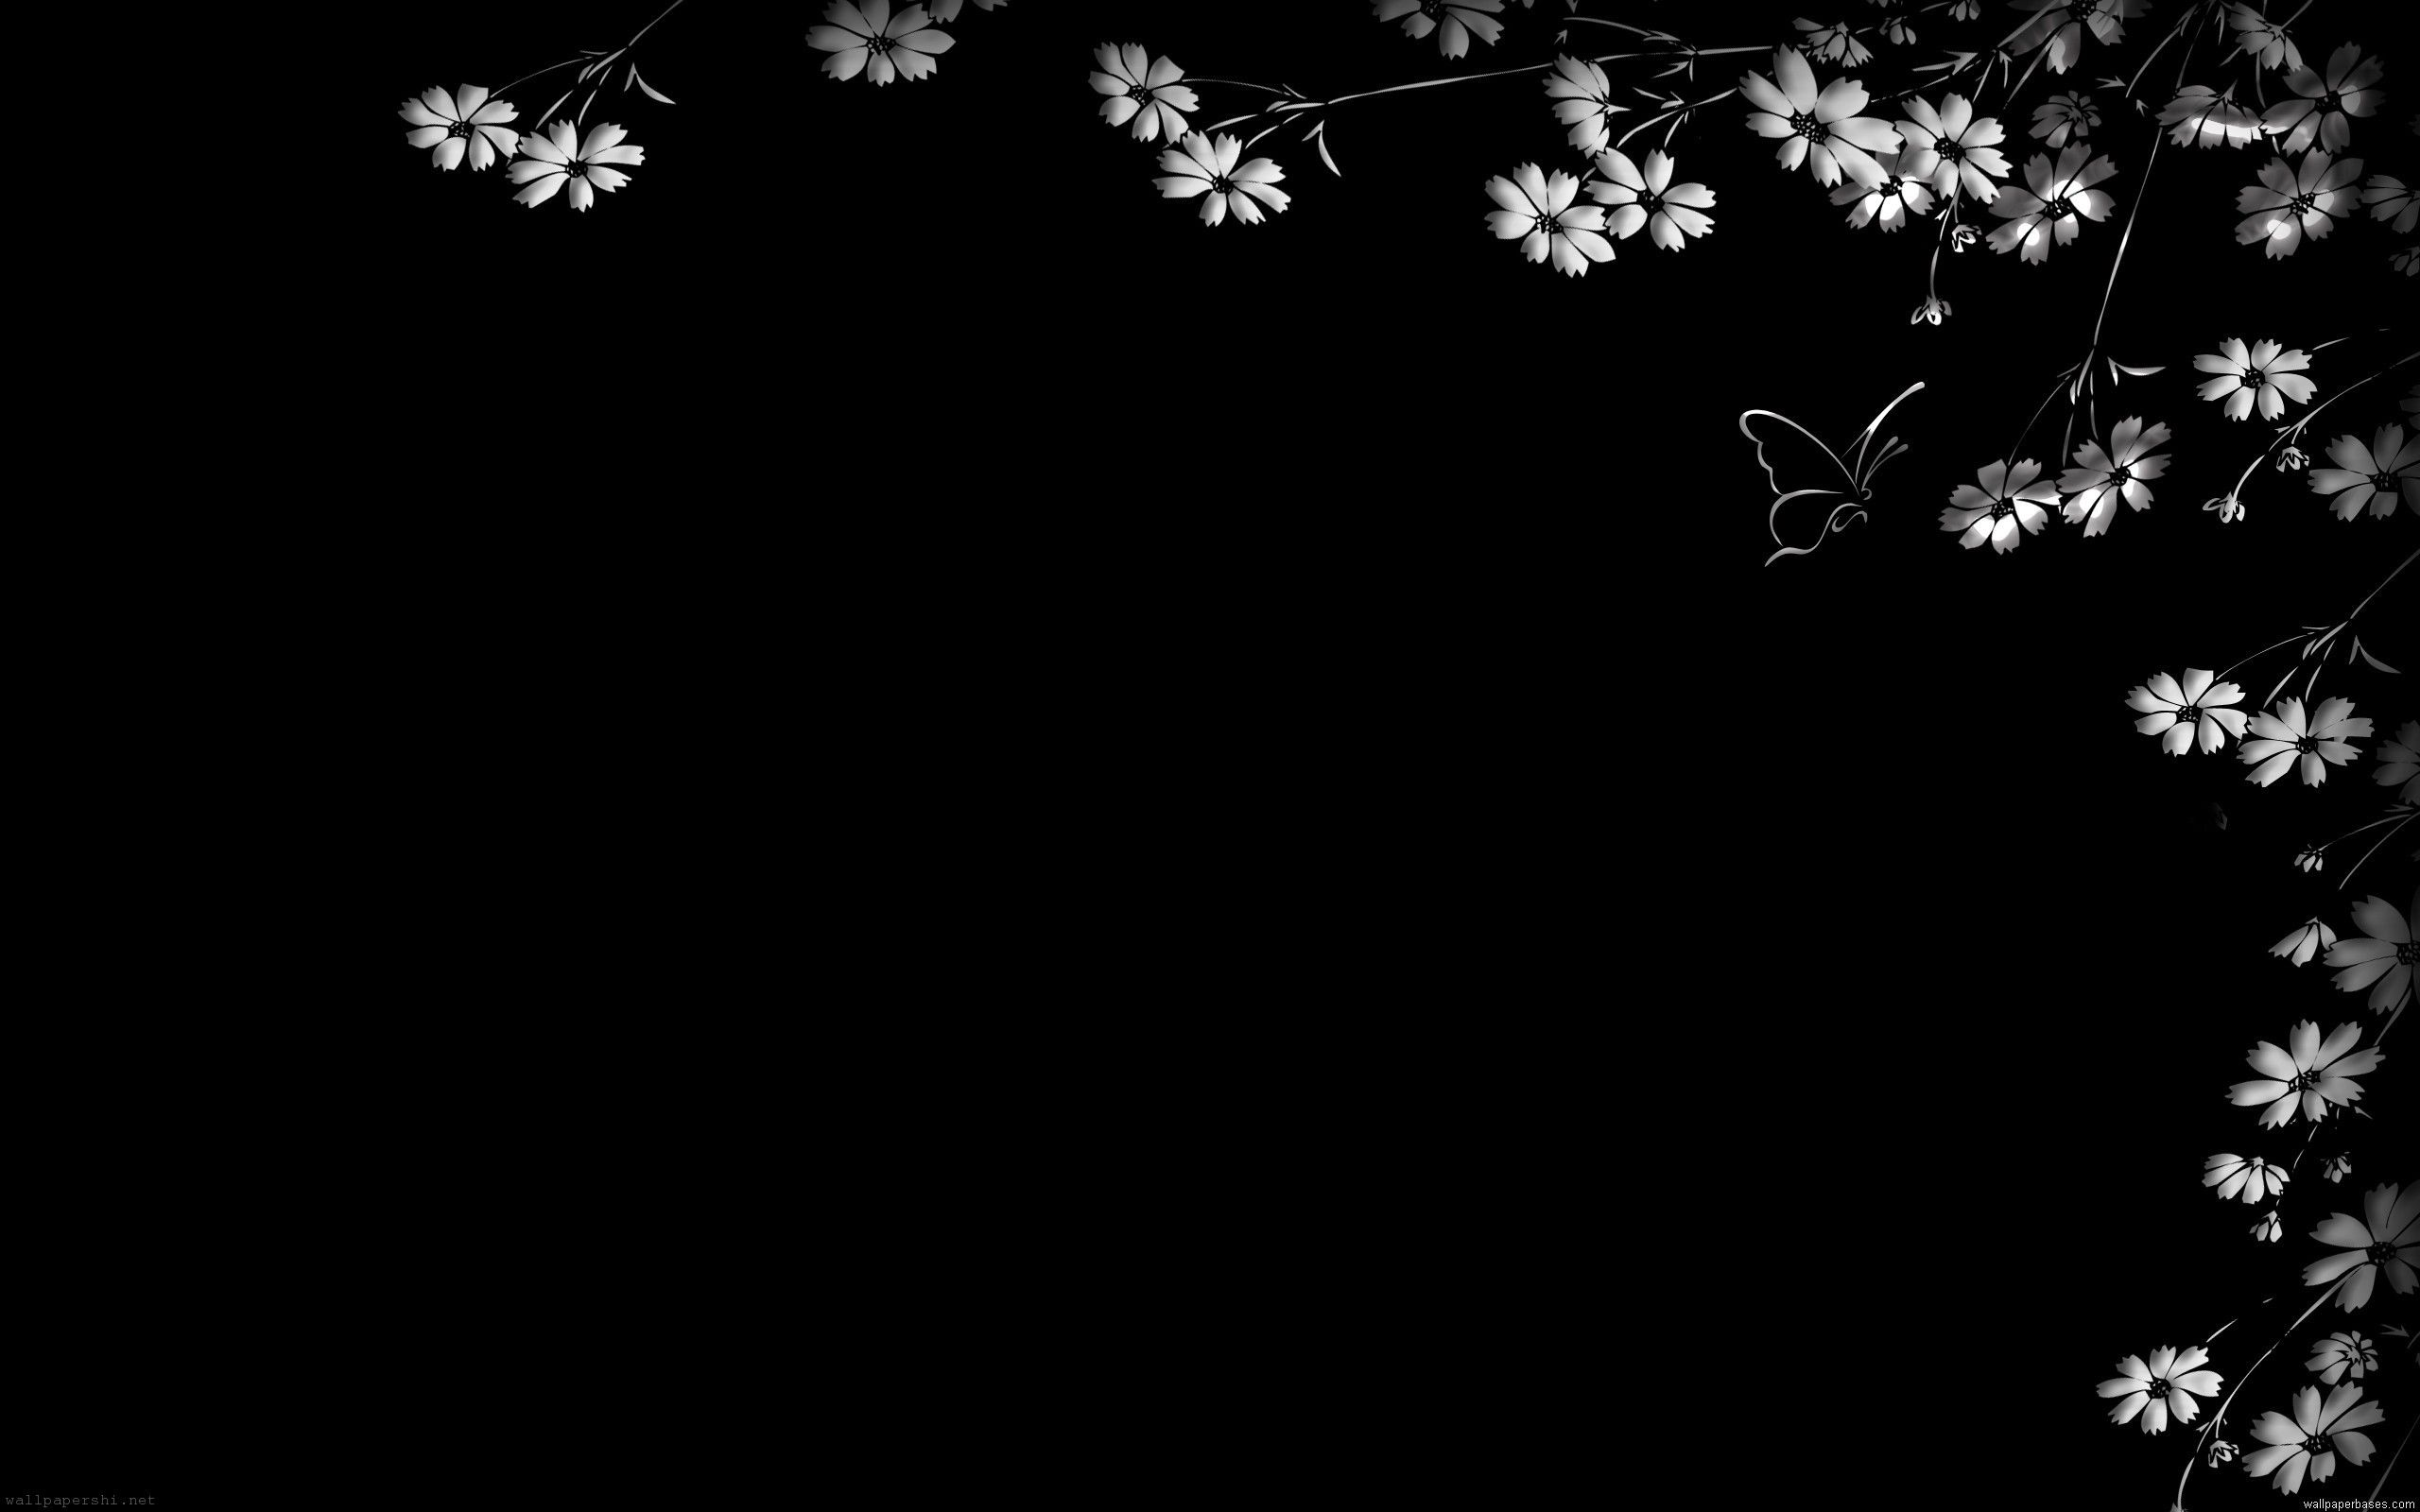 Fontana Ca Desktop Wallpaper Black Black Background Wallpaper Black And White Flowers